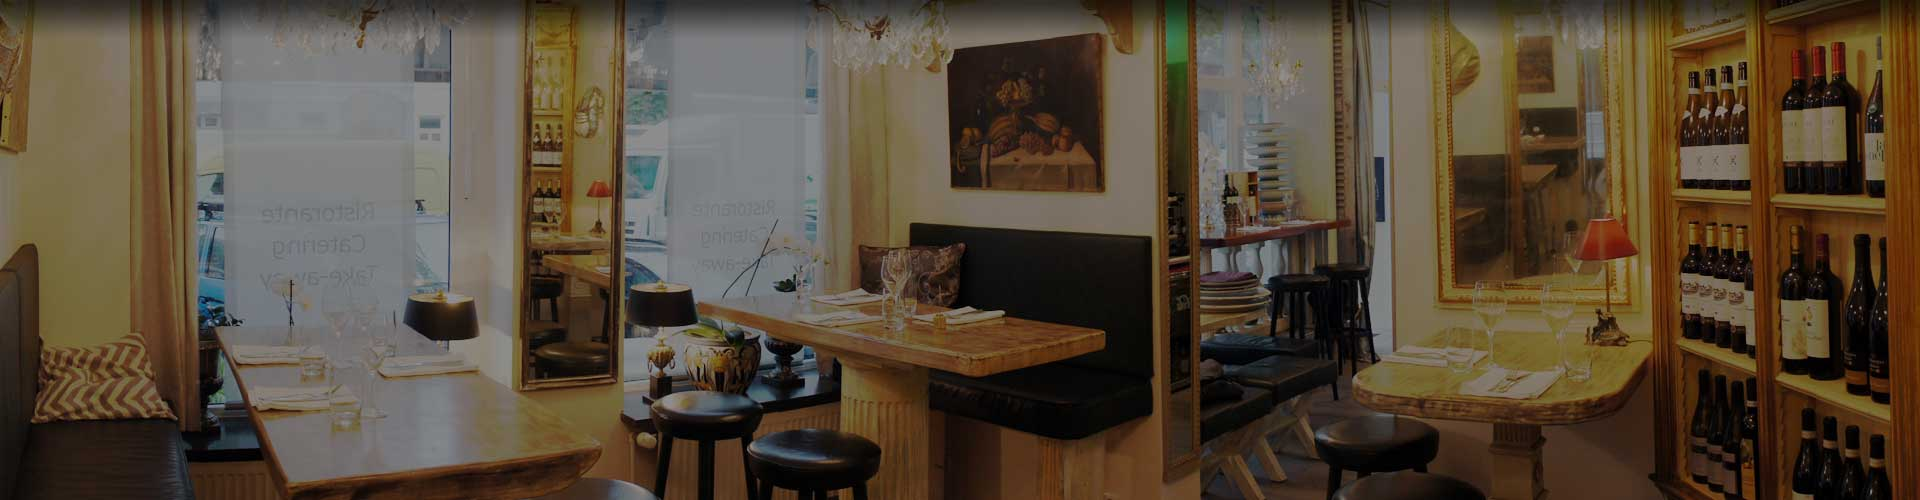 la fattoria hamburg home italienische spezialit ten. Black Bedroom Furniture Sets. Home Design Ideas